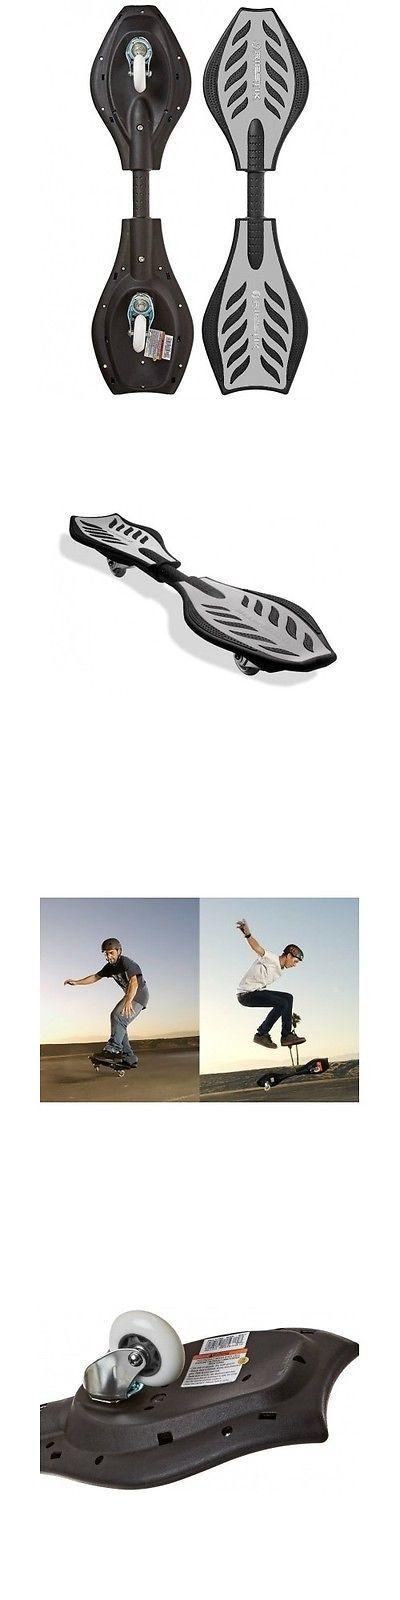 Other Skate- and Longboarding 16265: Caster Board Skateboard Wave Roller Razor Street Surf Snowboard Ripstik Silver -> BUY IT NOW ONLY: $69.99 on eBay!